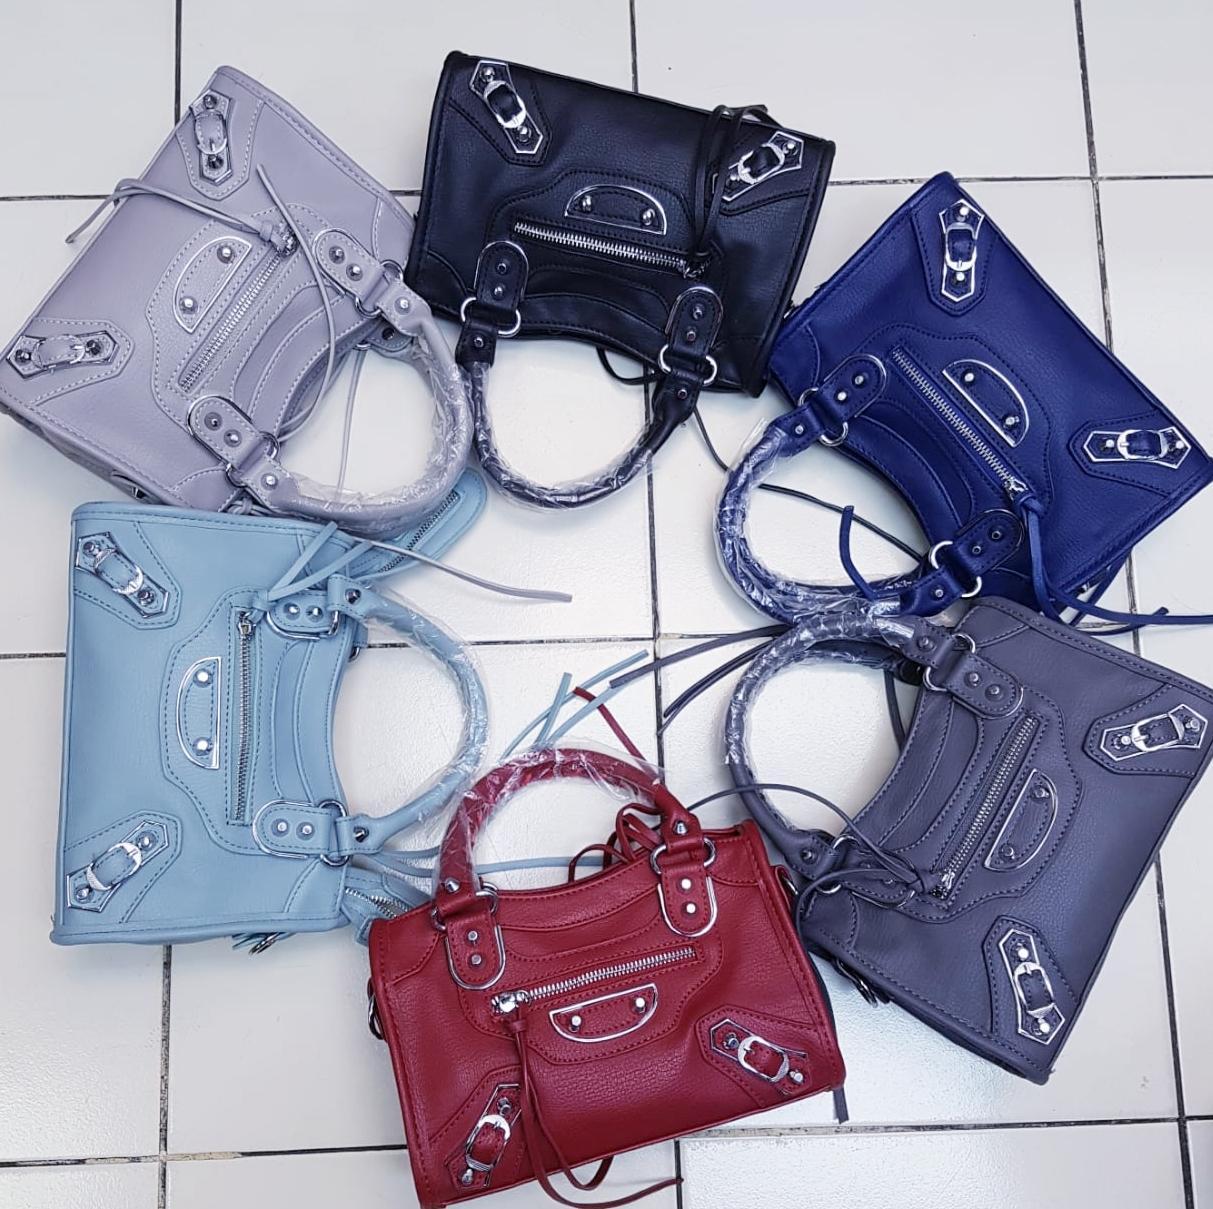 Tas balenciaga classic mini city bag SEMI PREMIUM(6WARNA HITAM/NAVY/ABU TUA/ABU MUDA/SOFT BLUE/MERAH)